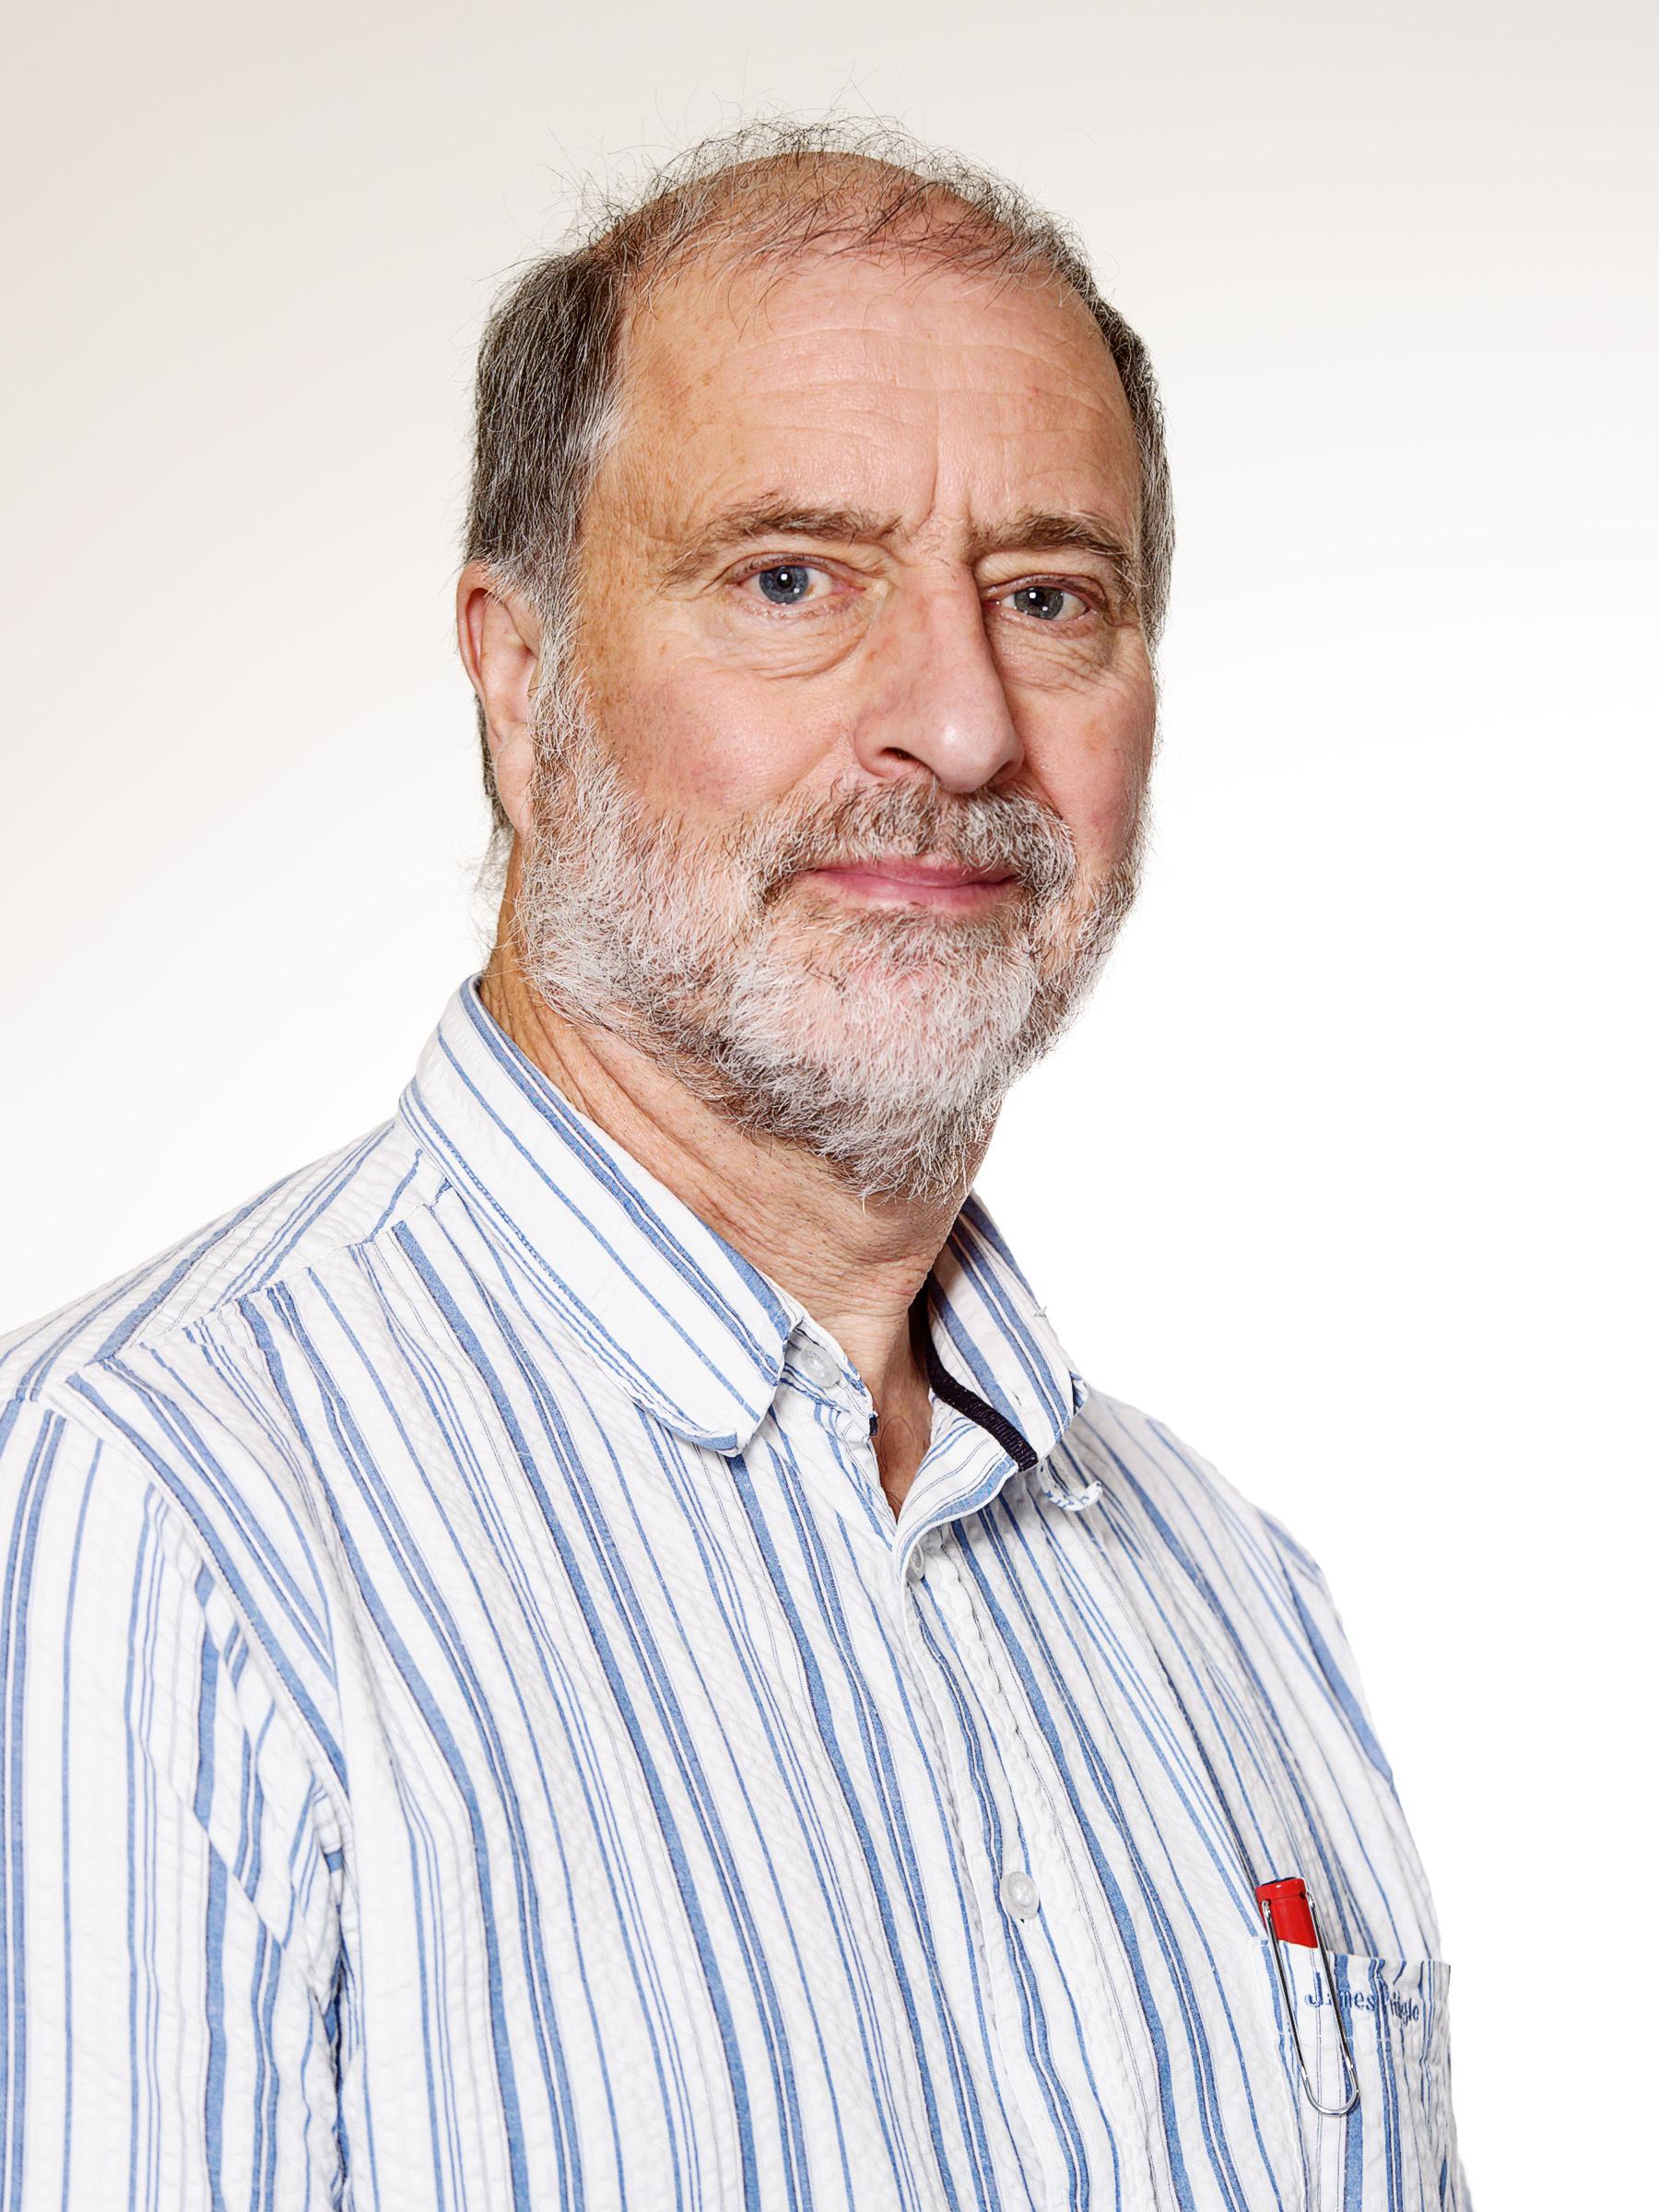 Andrew Basden